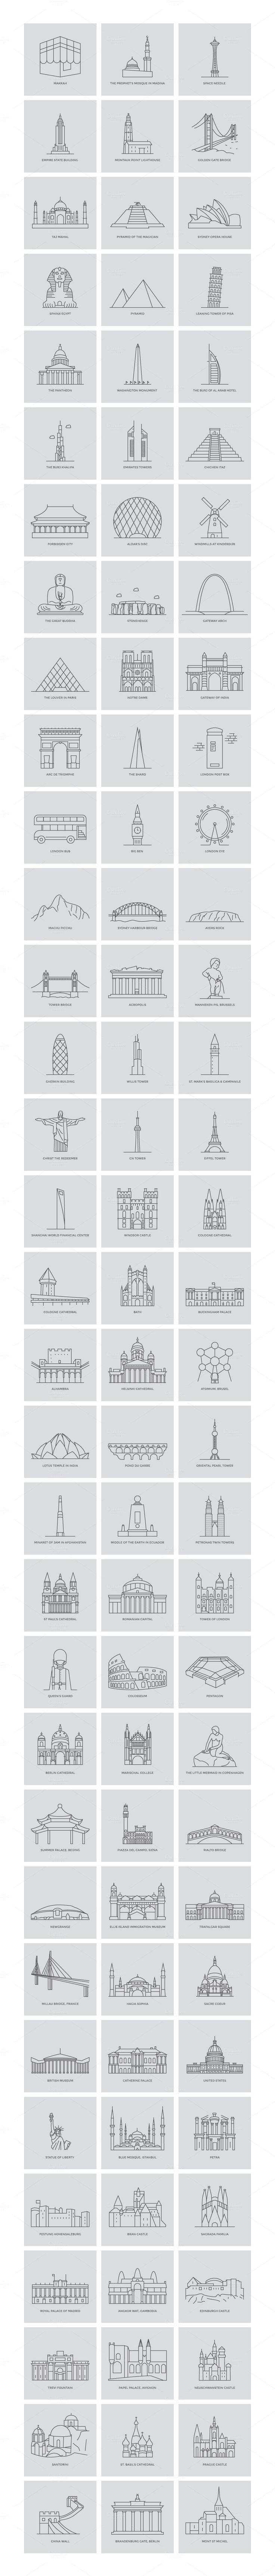 99 World Landmarks Illustration by Creative Stall on @creativemarket